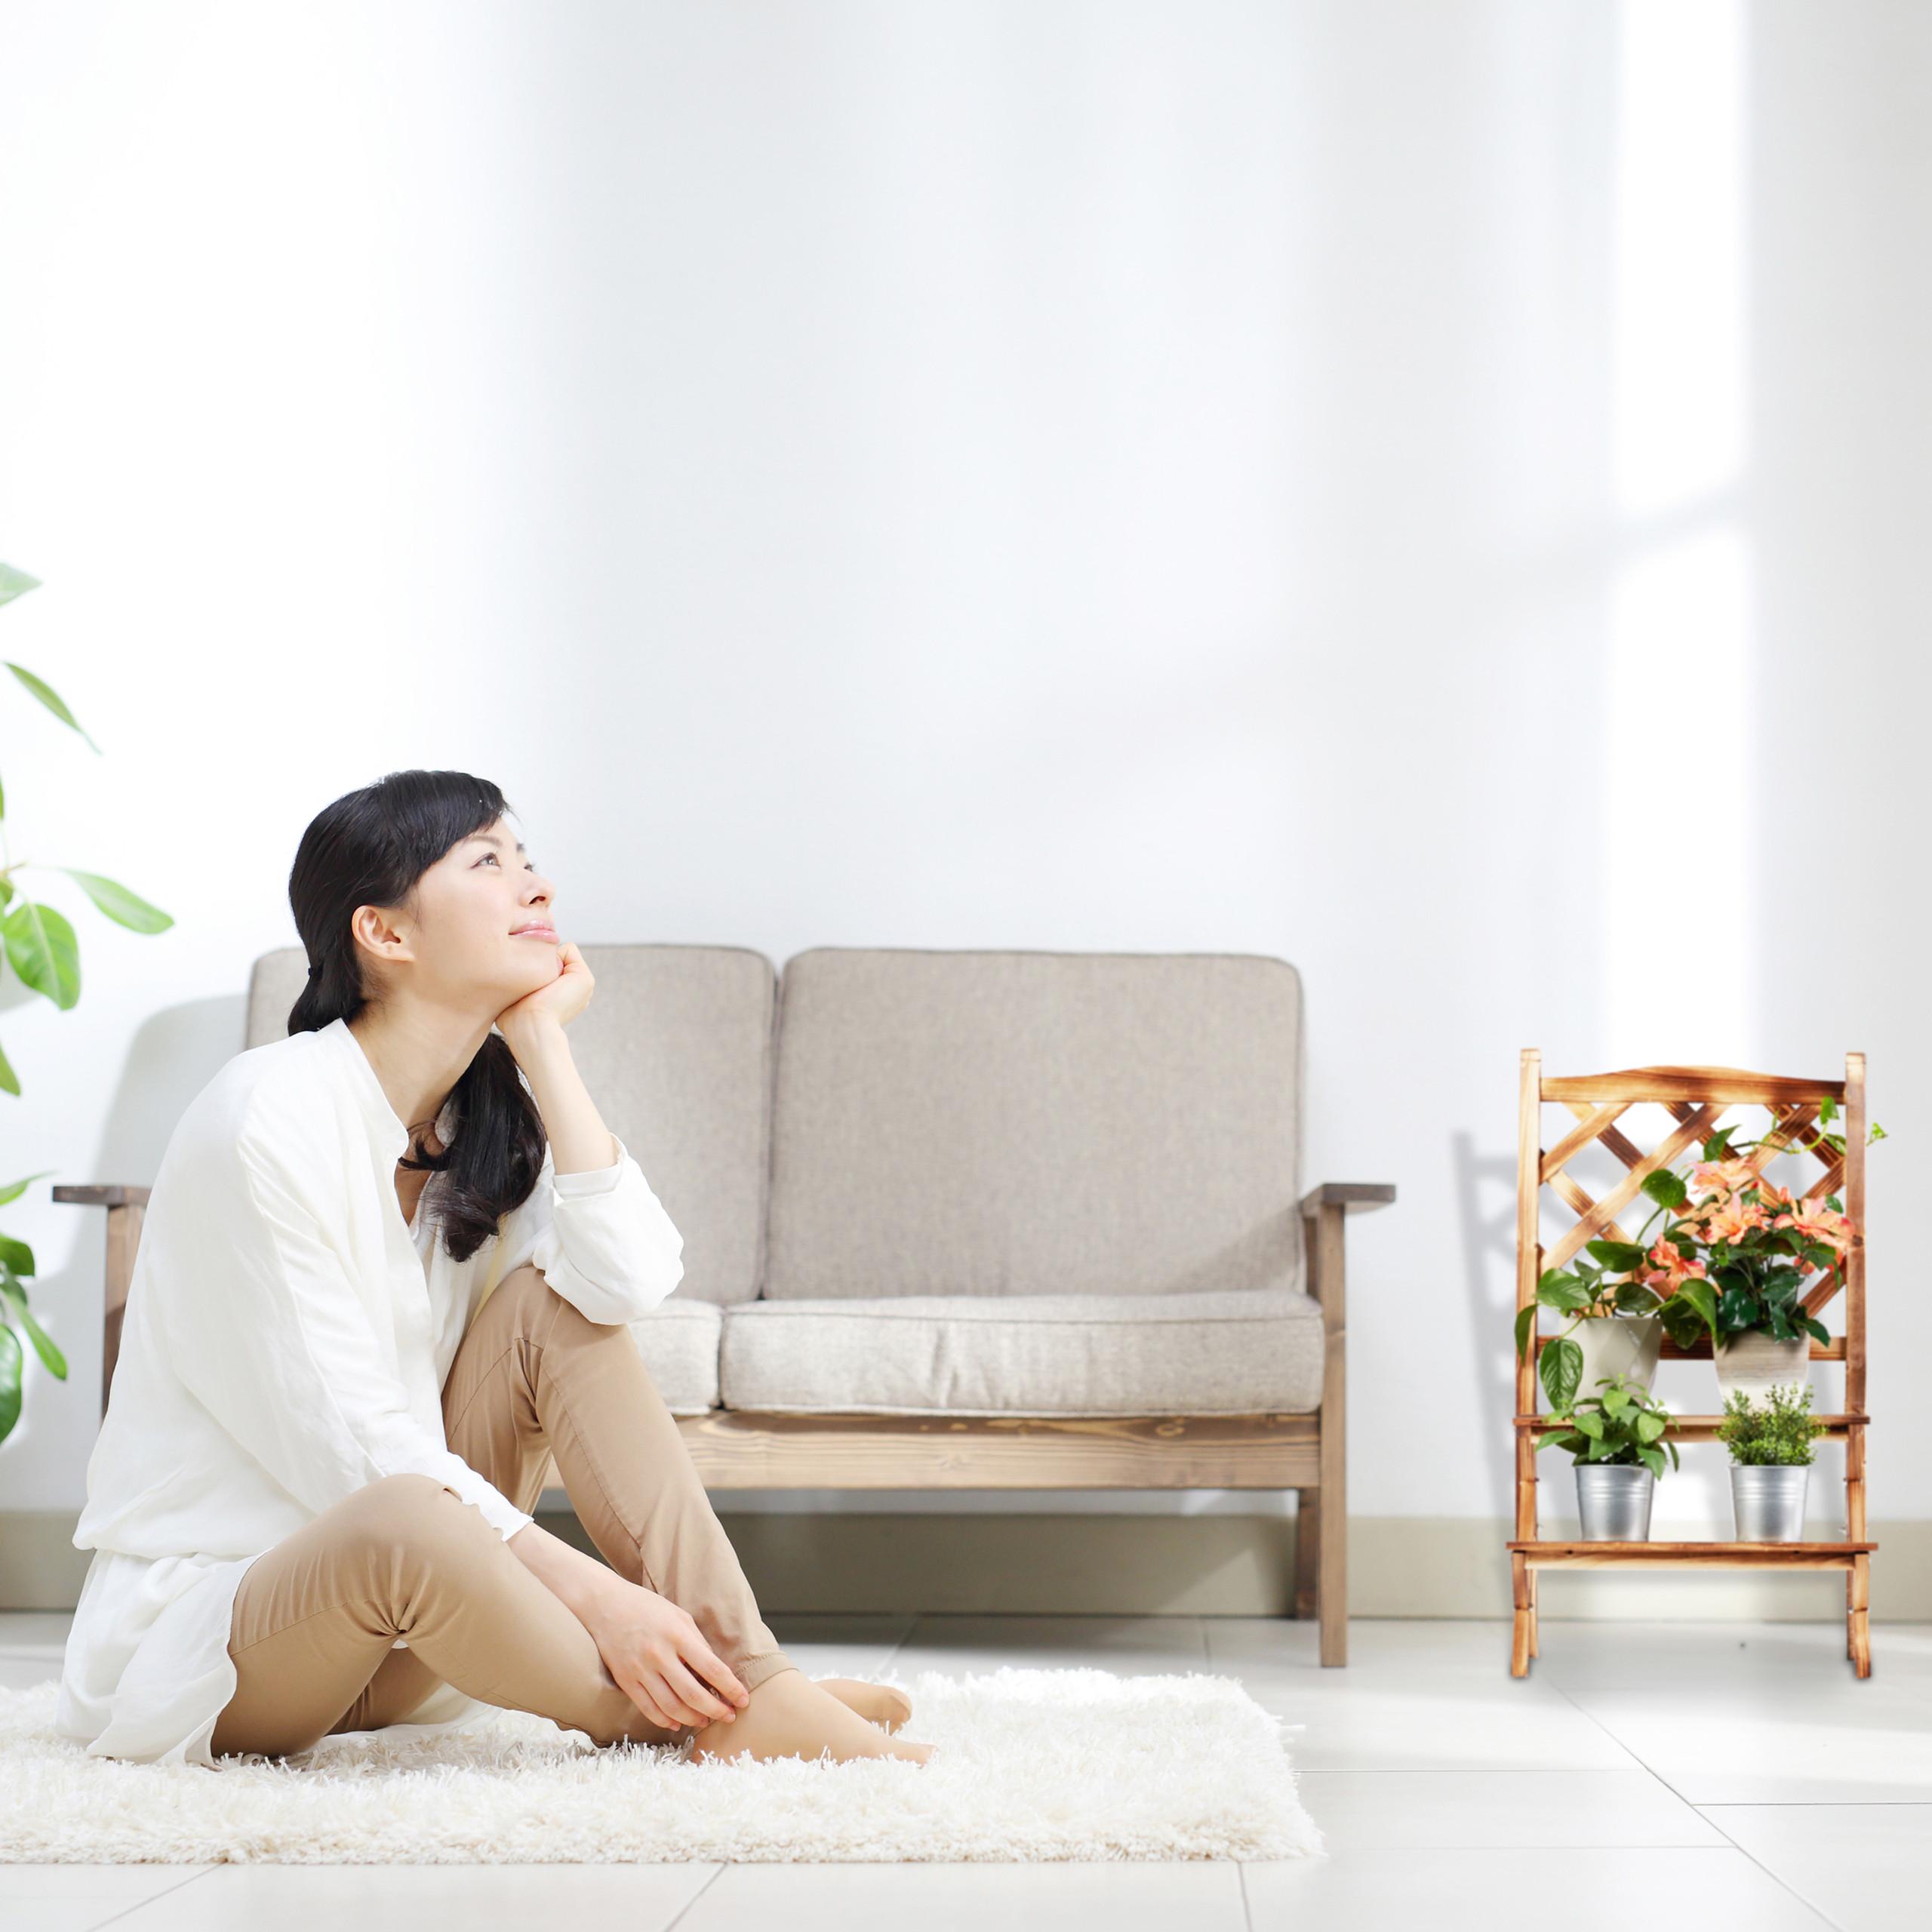 plantenrek-hout-plantentrap-plantenklimrek-bloemenrek-bloementrap miniatuur 4